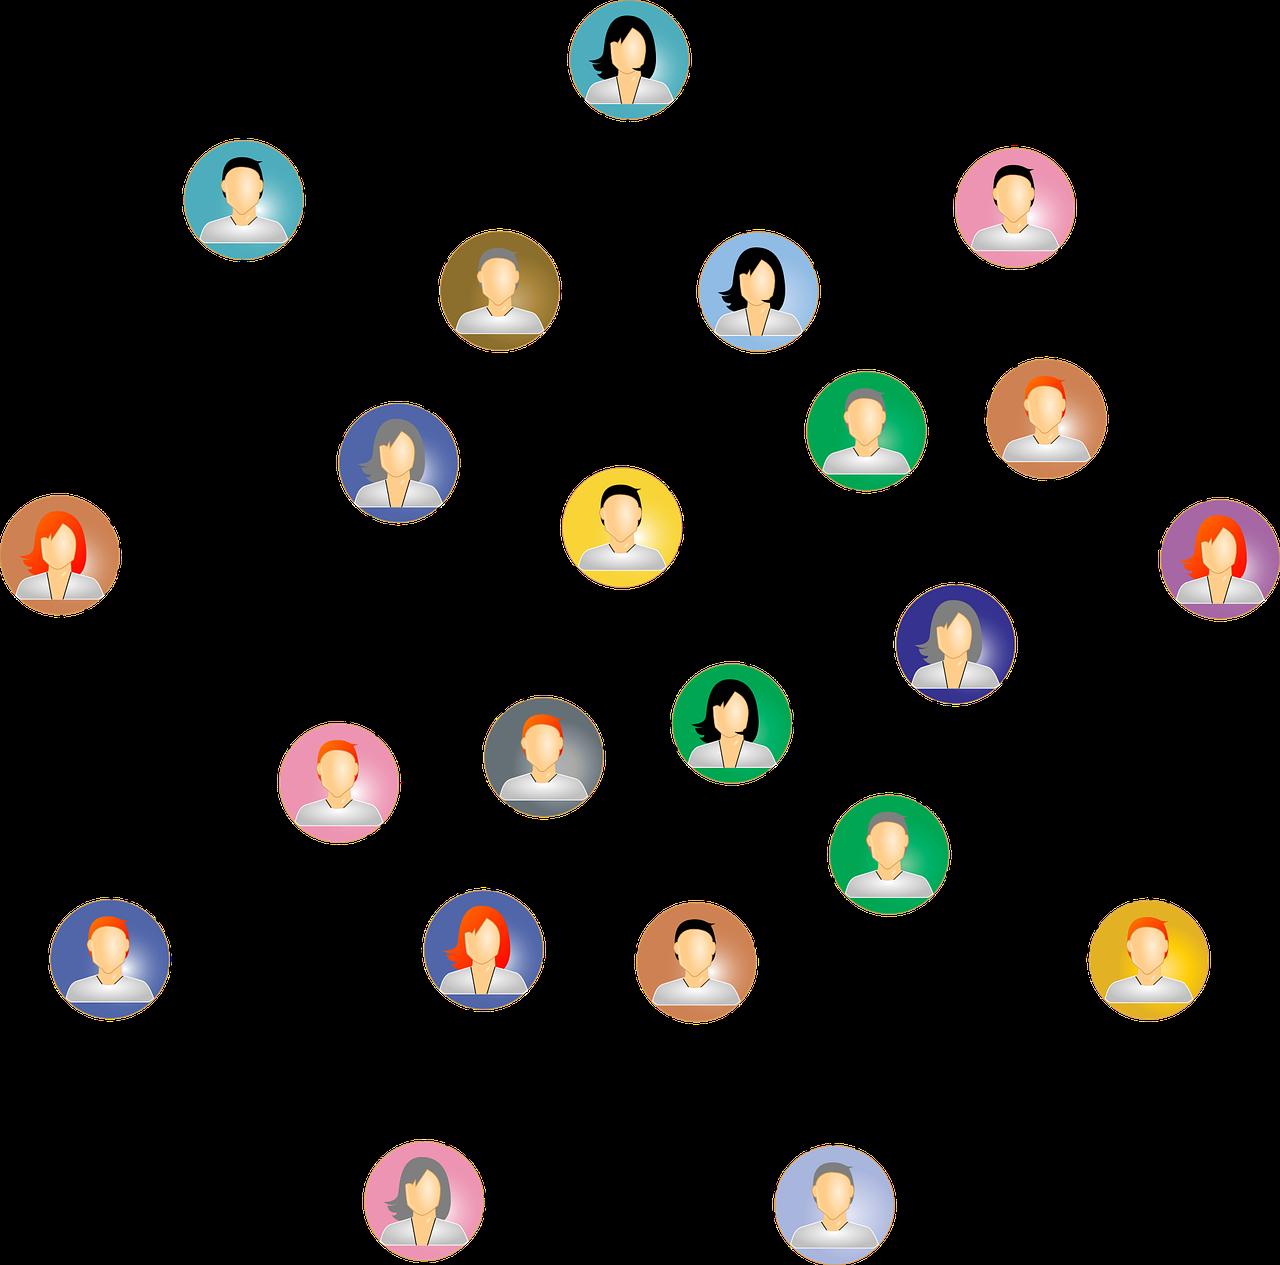 Representation of a social network